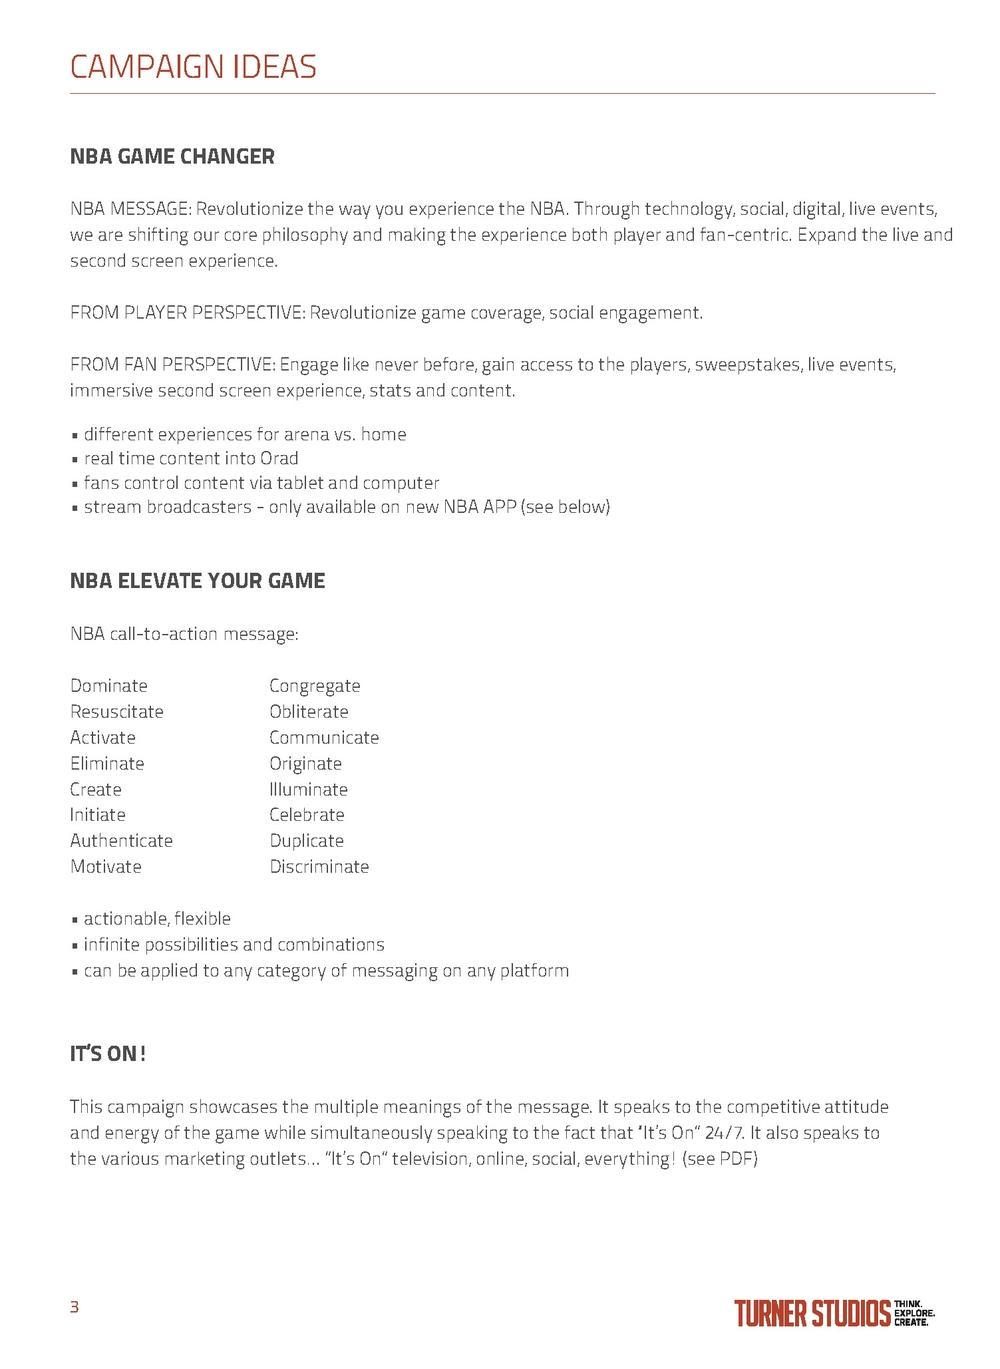 NBA 360 Marketing Presentation — Kasumi Mihori